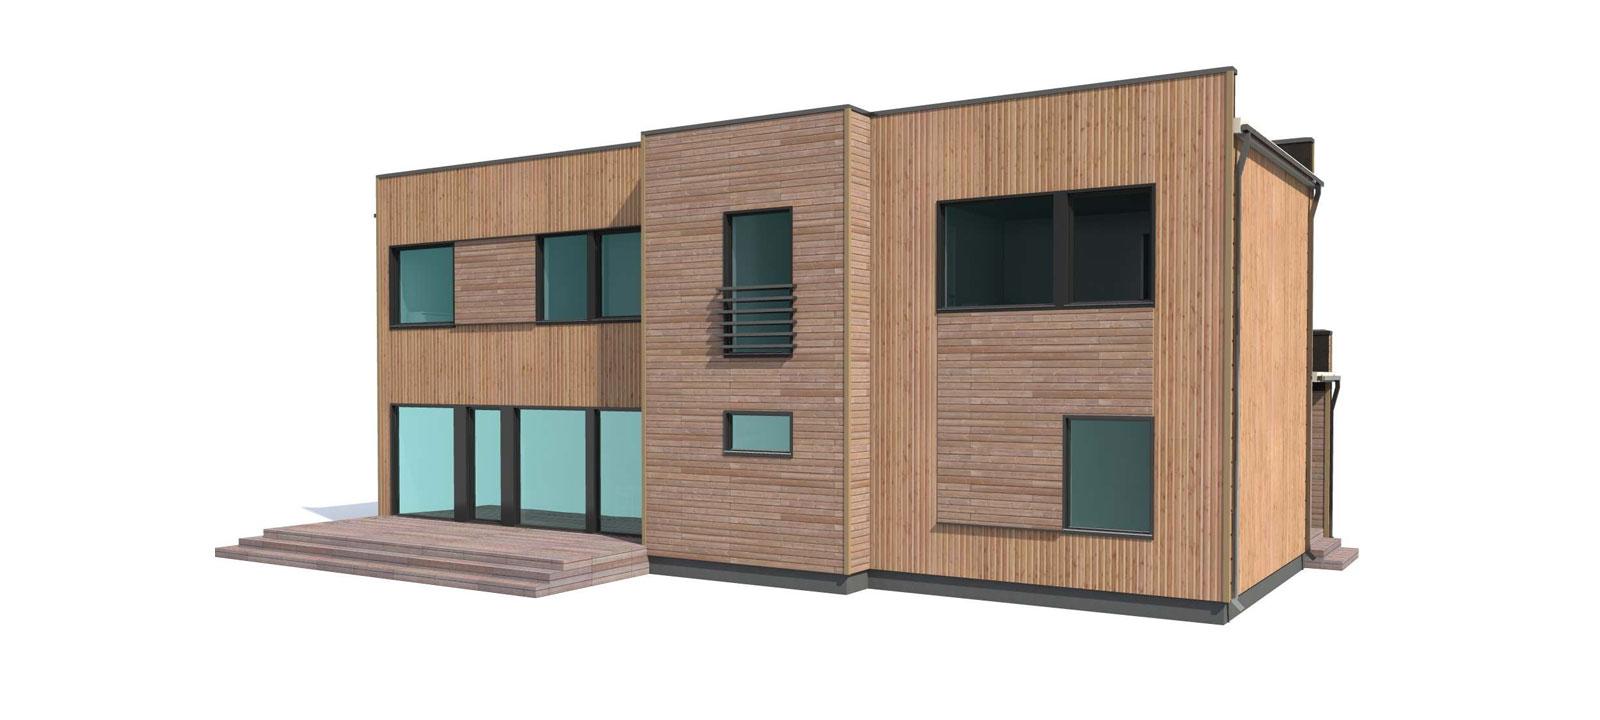 Woodville Design Houtbouw Woning Camelot